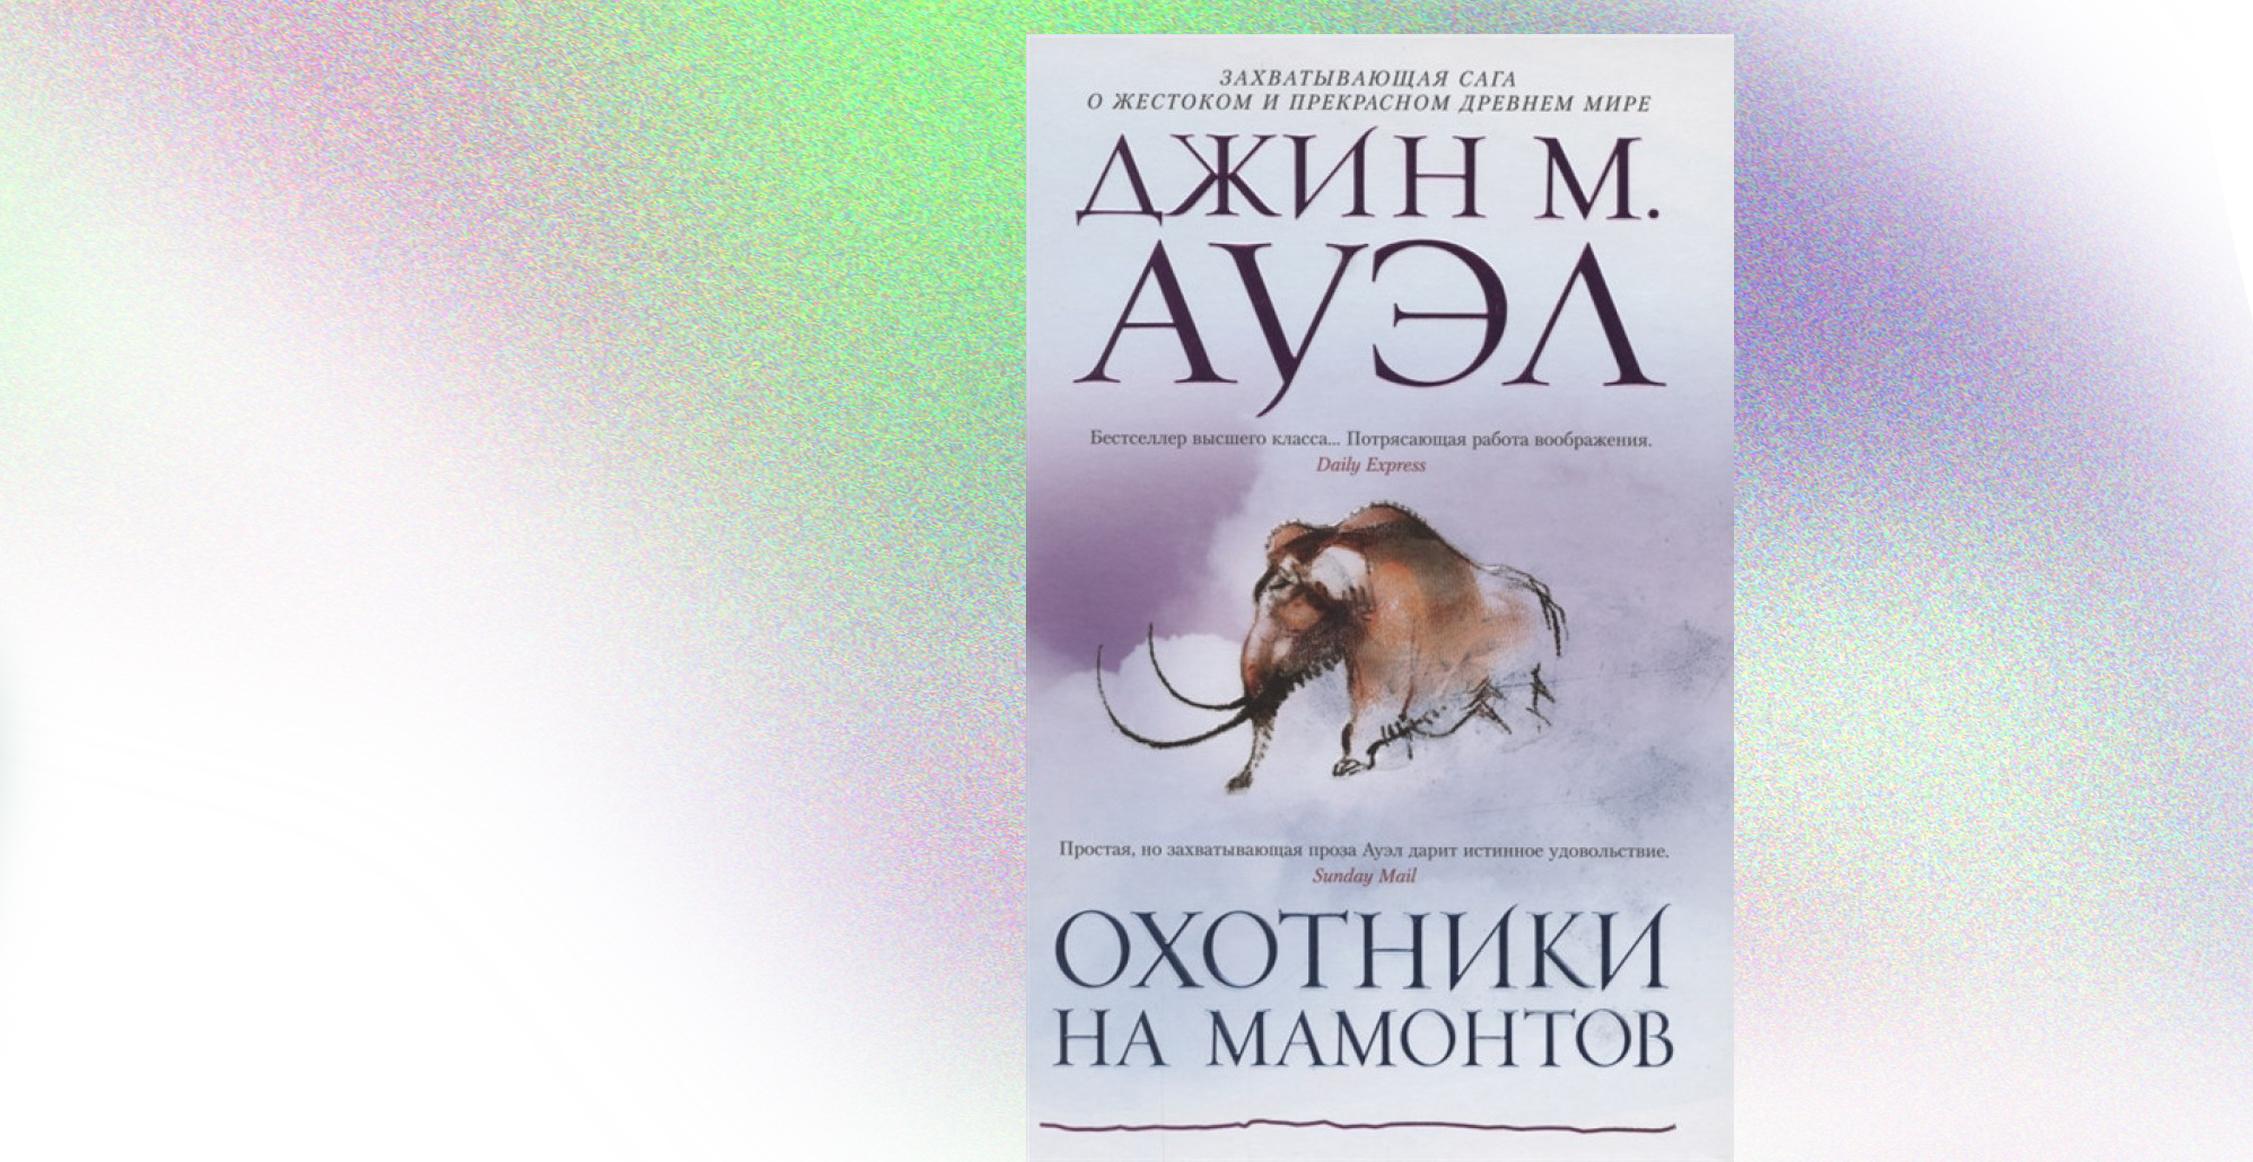 Книга, Охотники на мамонтов, Джин Ауэл, 978-5-389-19611-7